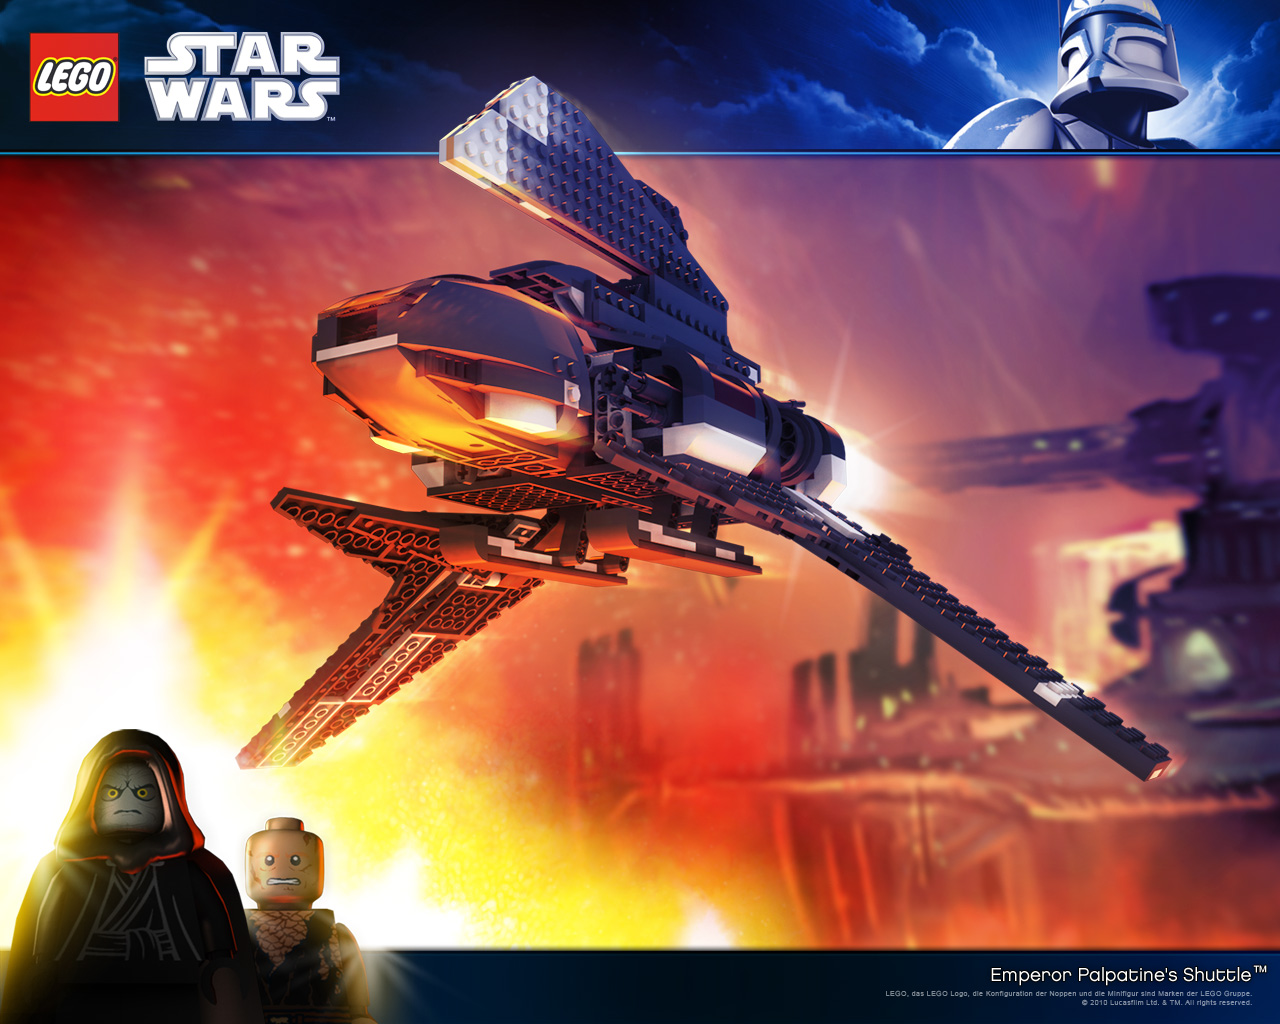 lego-star-wars-obrazki (5) title=